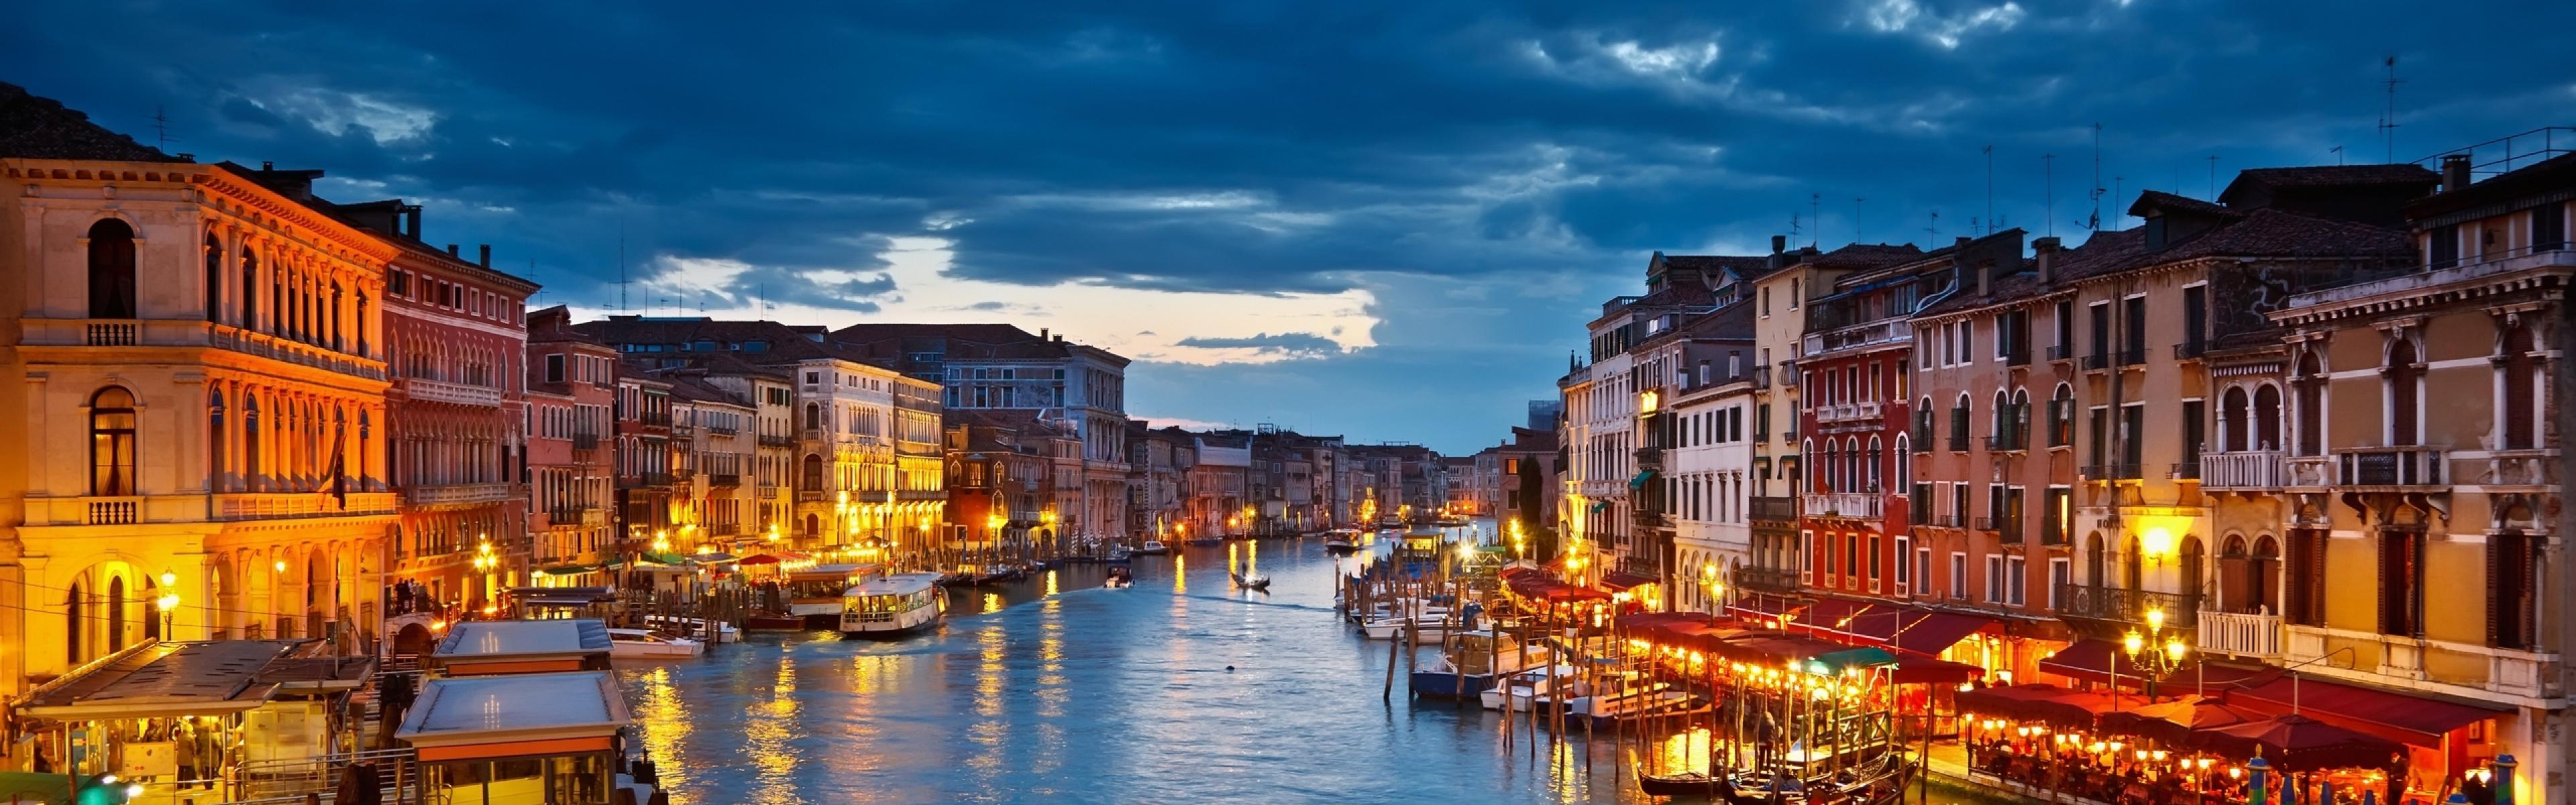 3840x1200 Wallpaper italy venice gondolas river 3840x1200